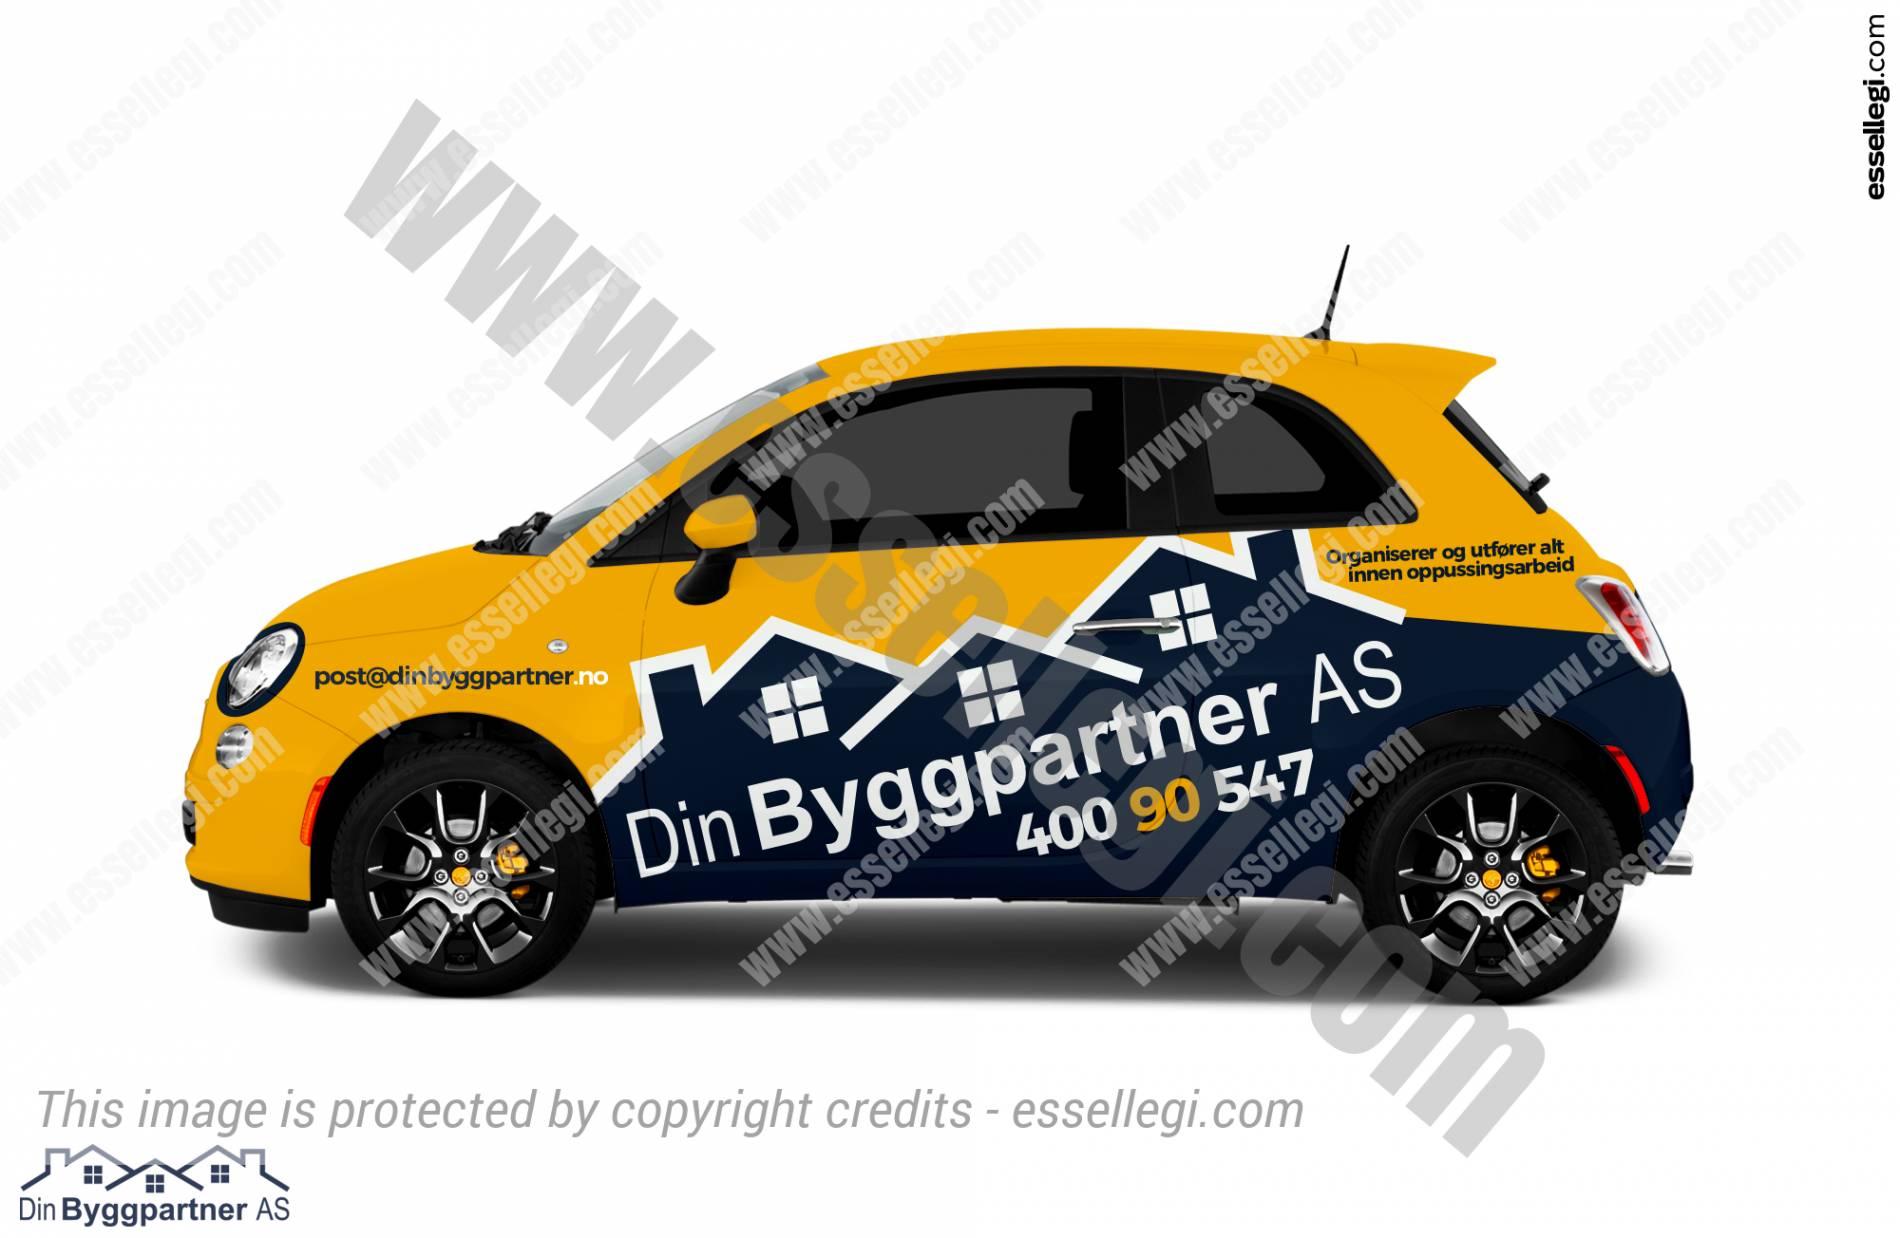 DIN BYGGPARTNER AS | CAR WRAP DESIGN 🇳🇴